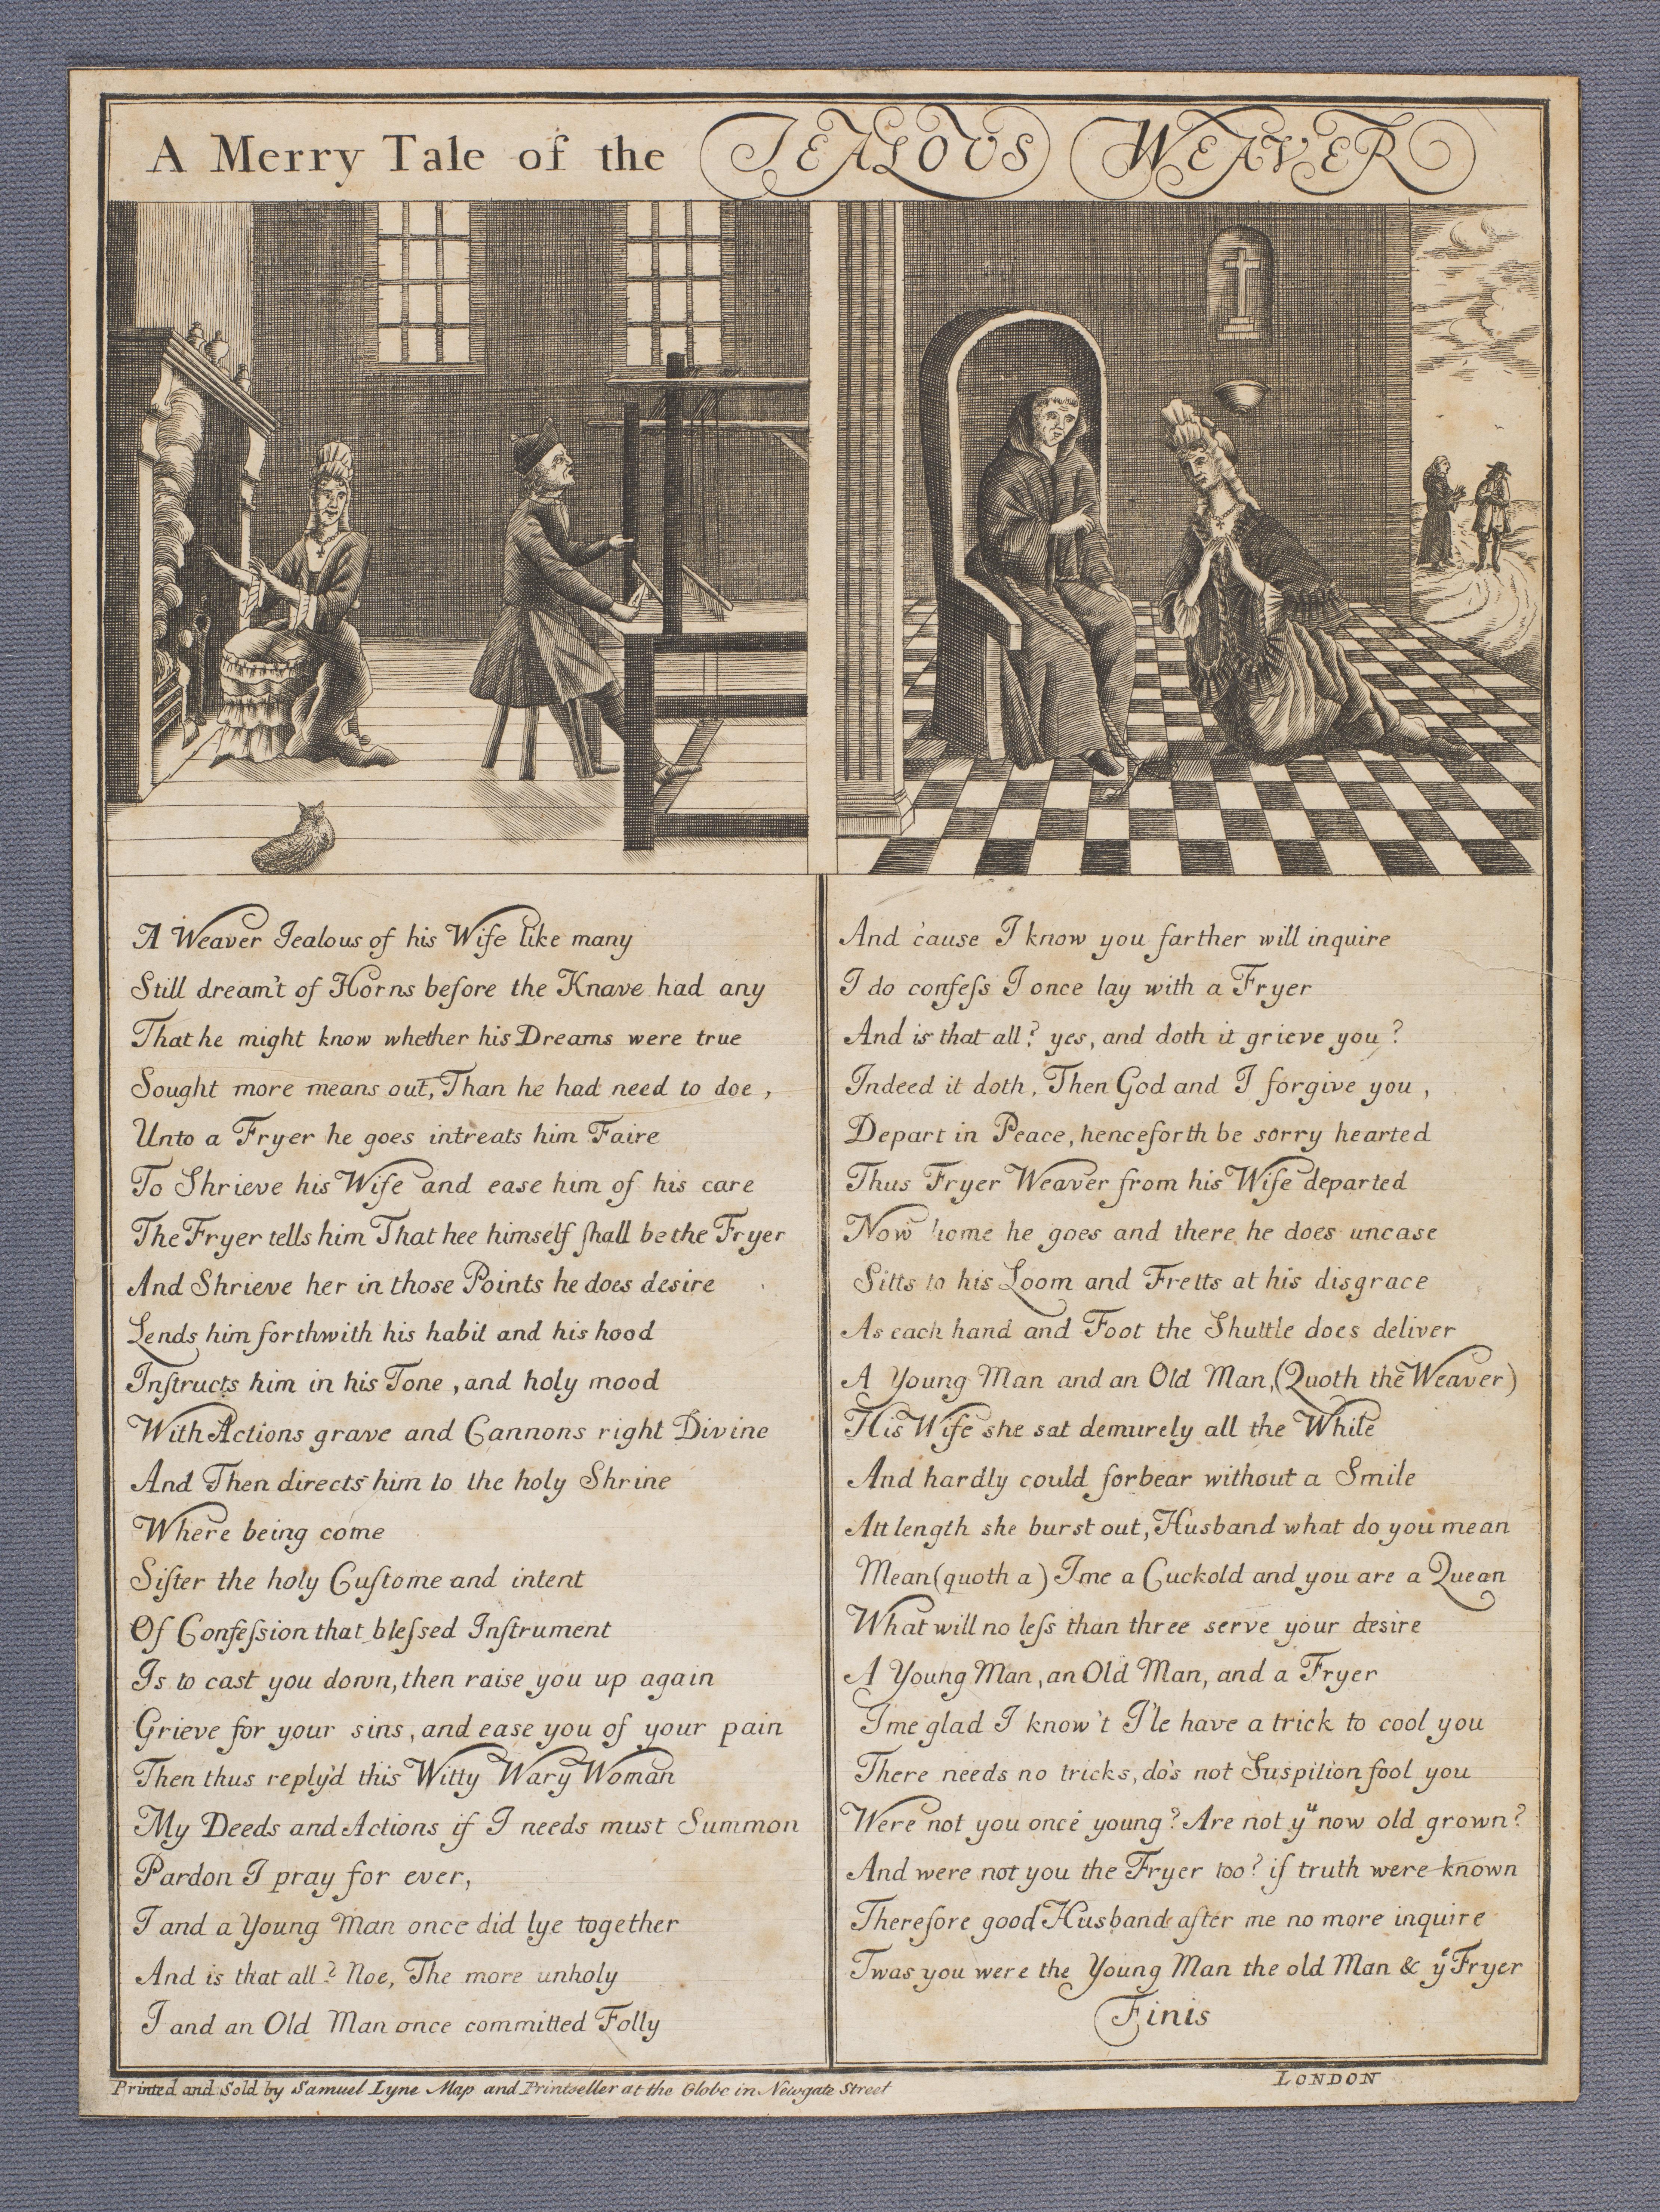 A merry tale of the jealous weaver. Detailed description below